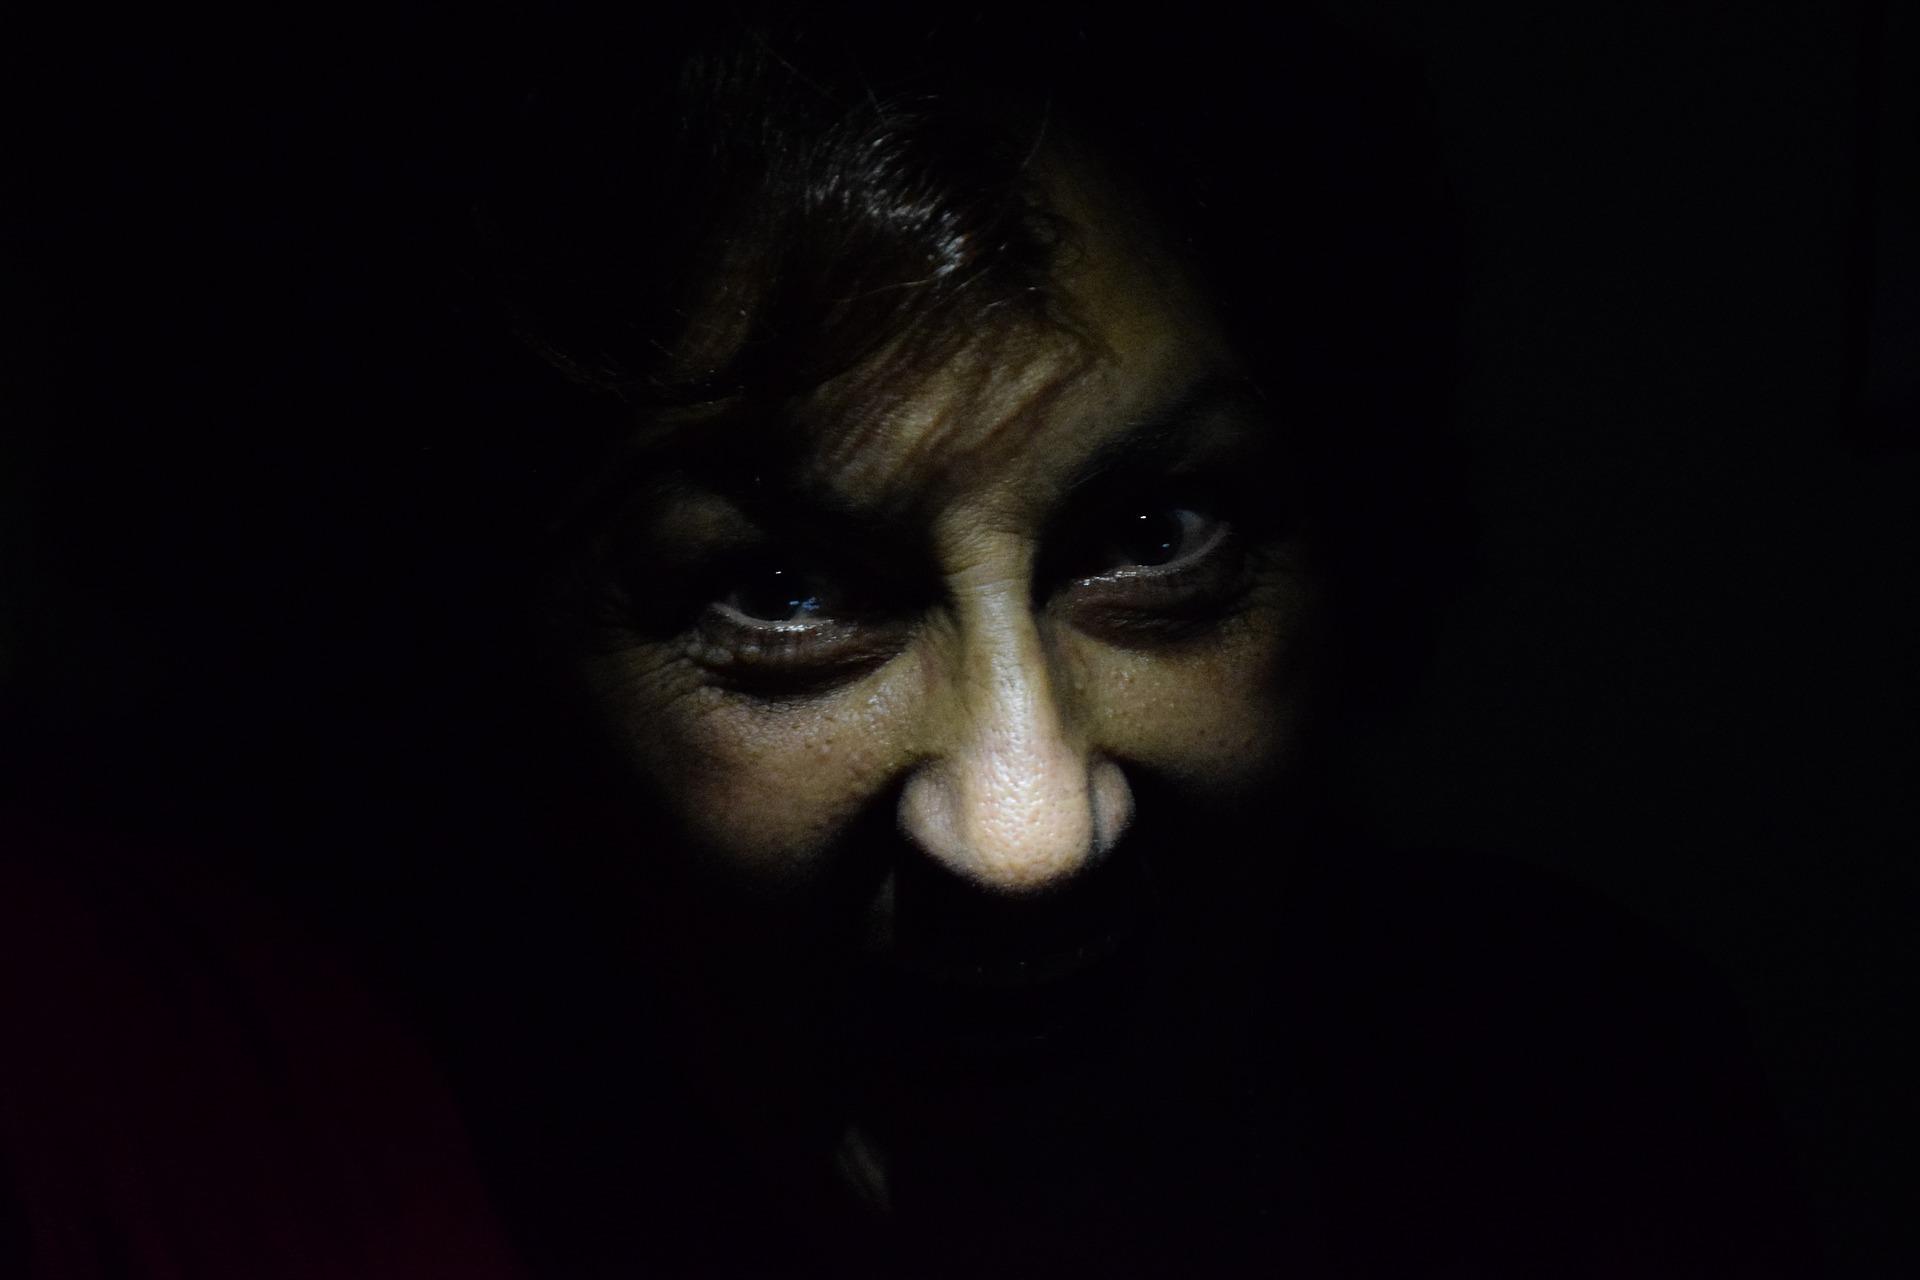 darkness-1485598_1920